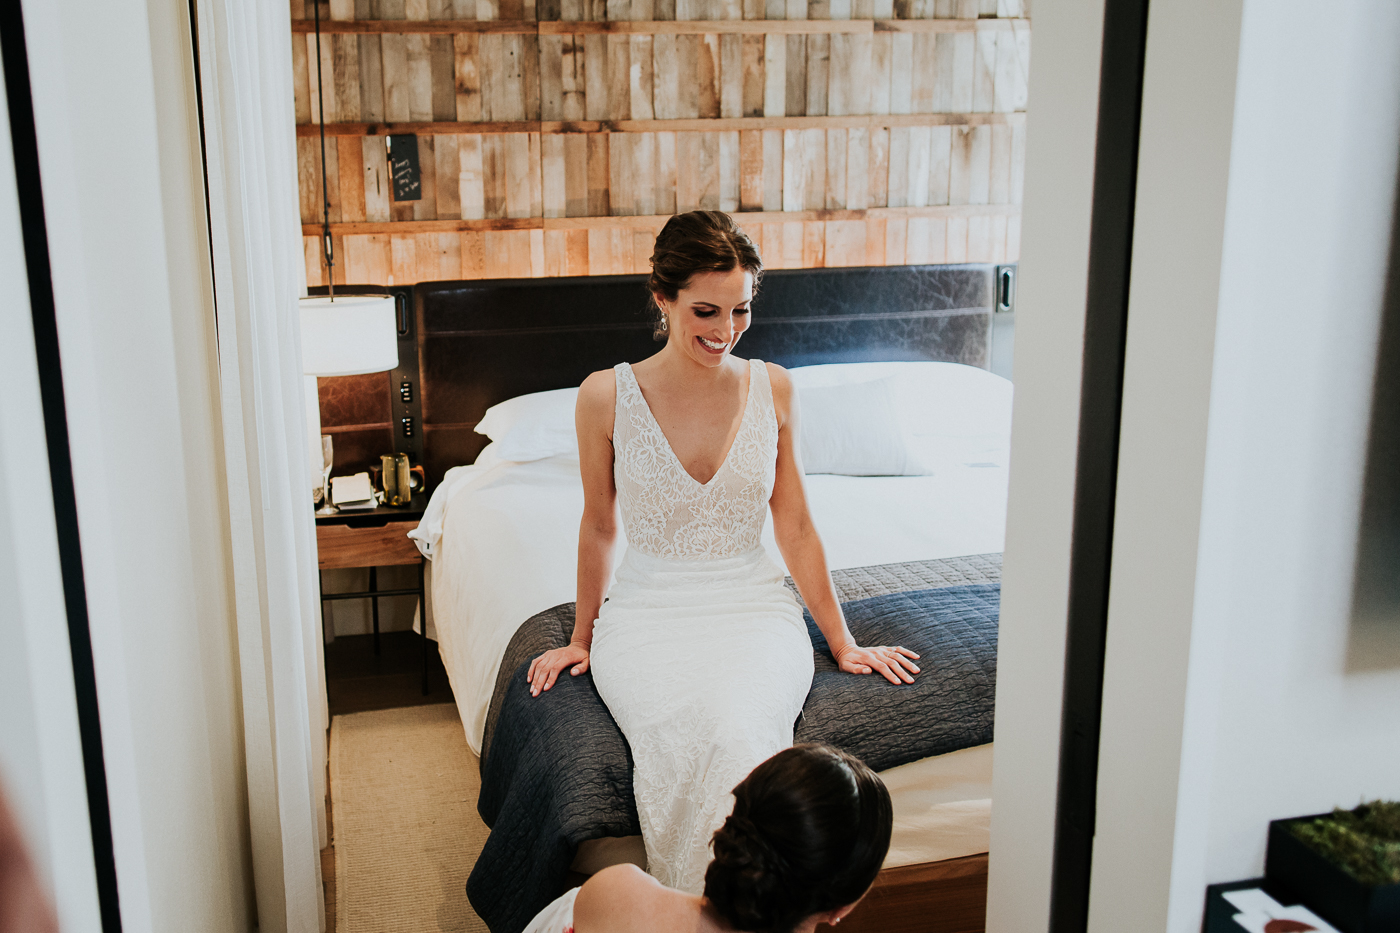 NYC-Central-Park-Conservatory-Garden-Intimate-Elopement-Documentary-Wedding-Photographer-9.jpg